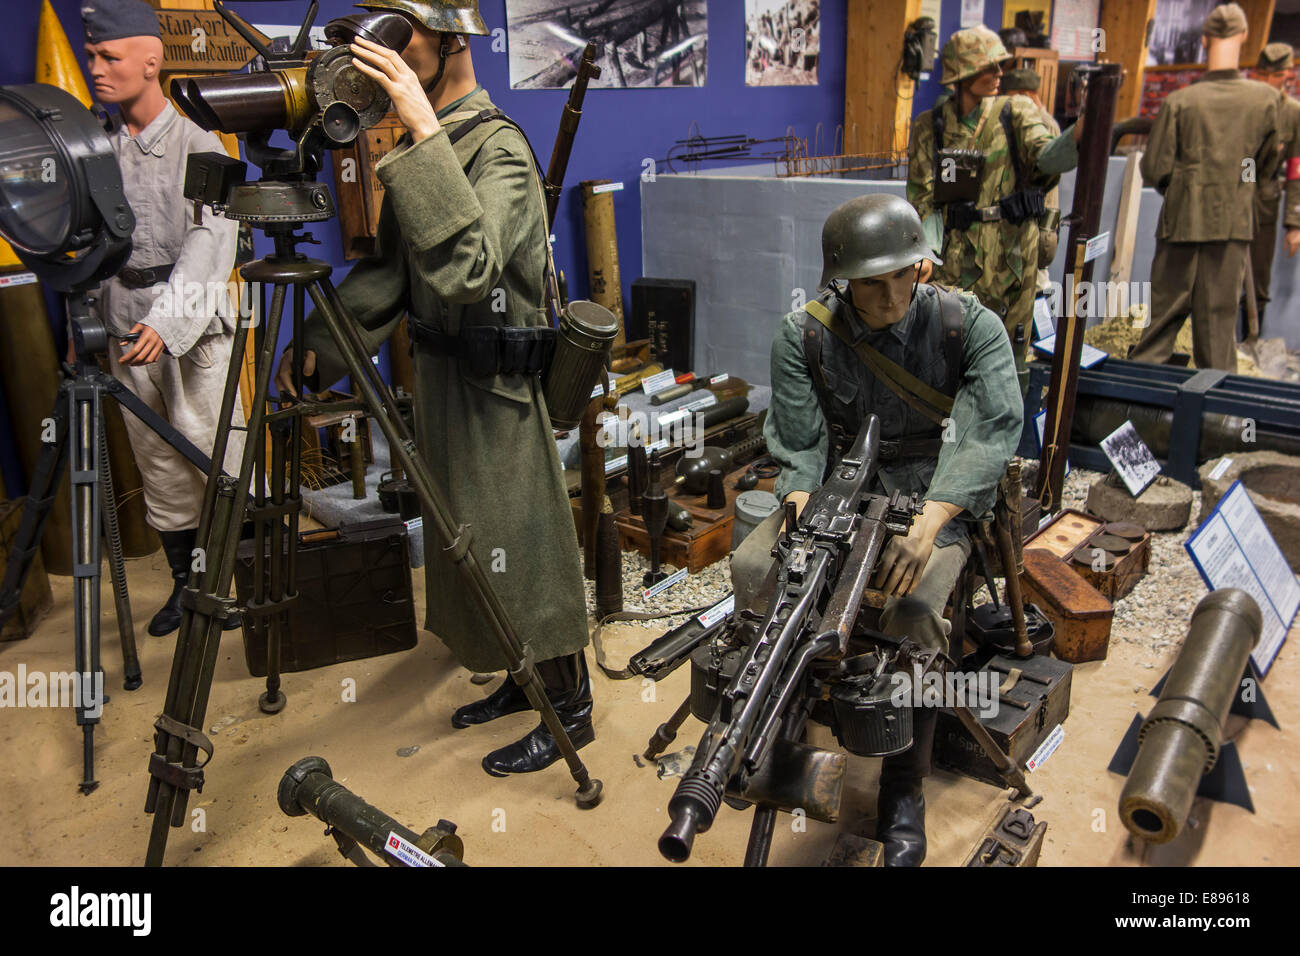 Weapons Of Ww2 German Army Stock Photos & Weapons Of Ww2 German Army